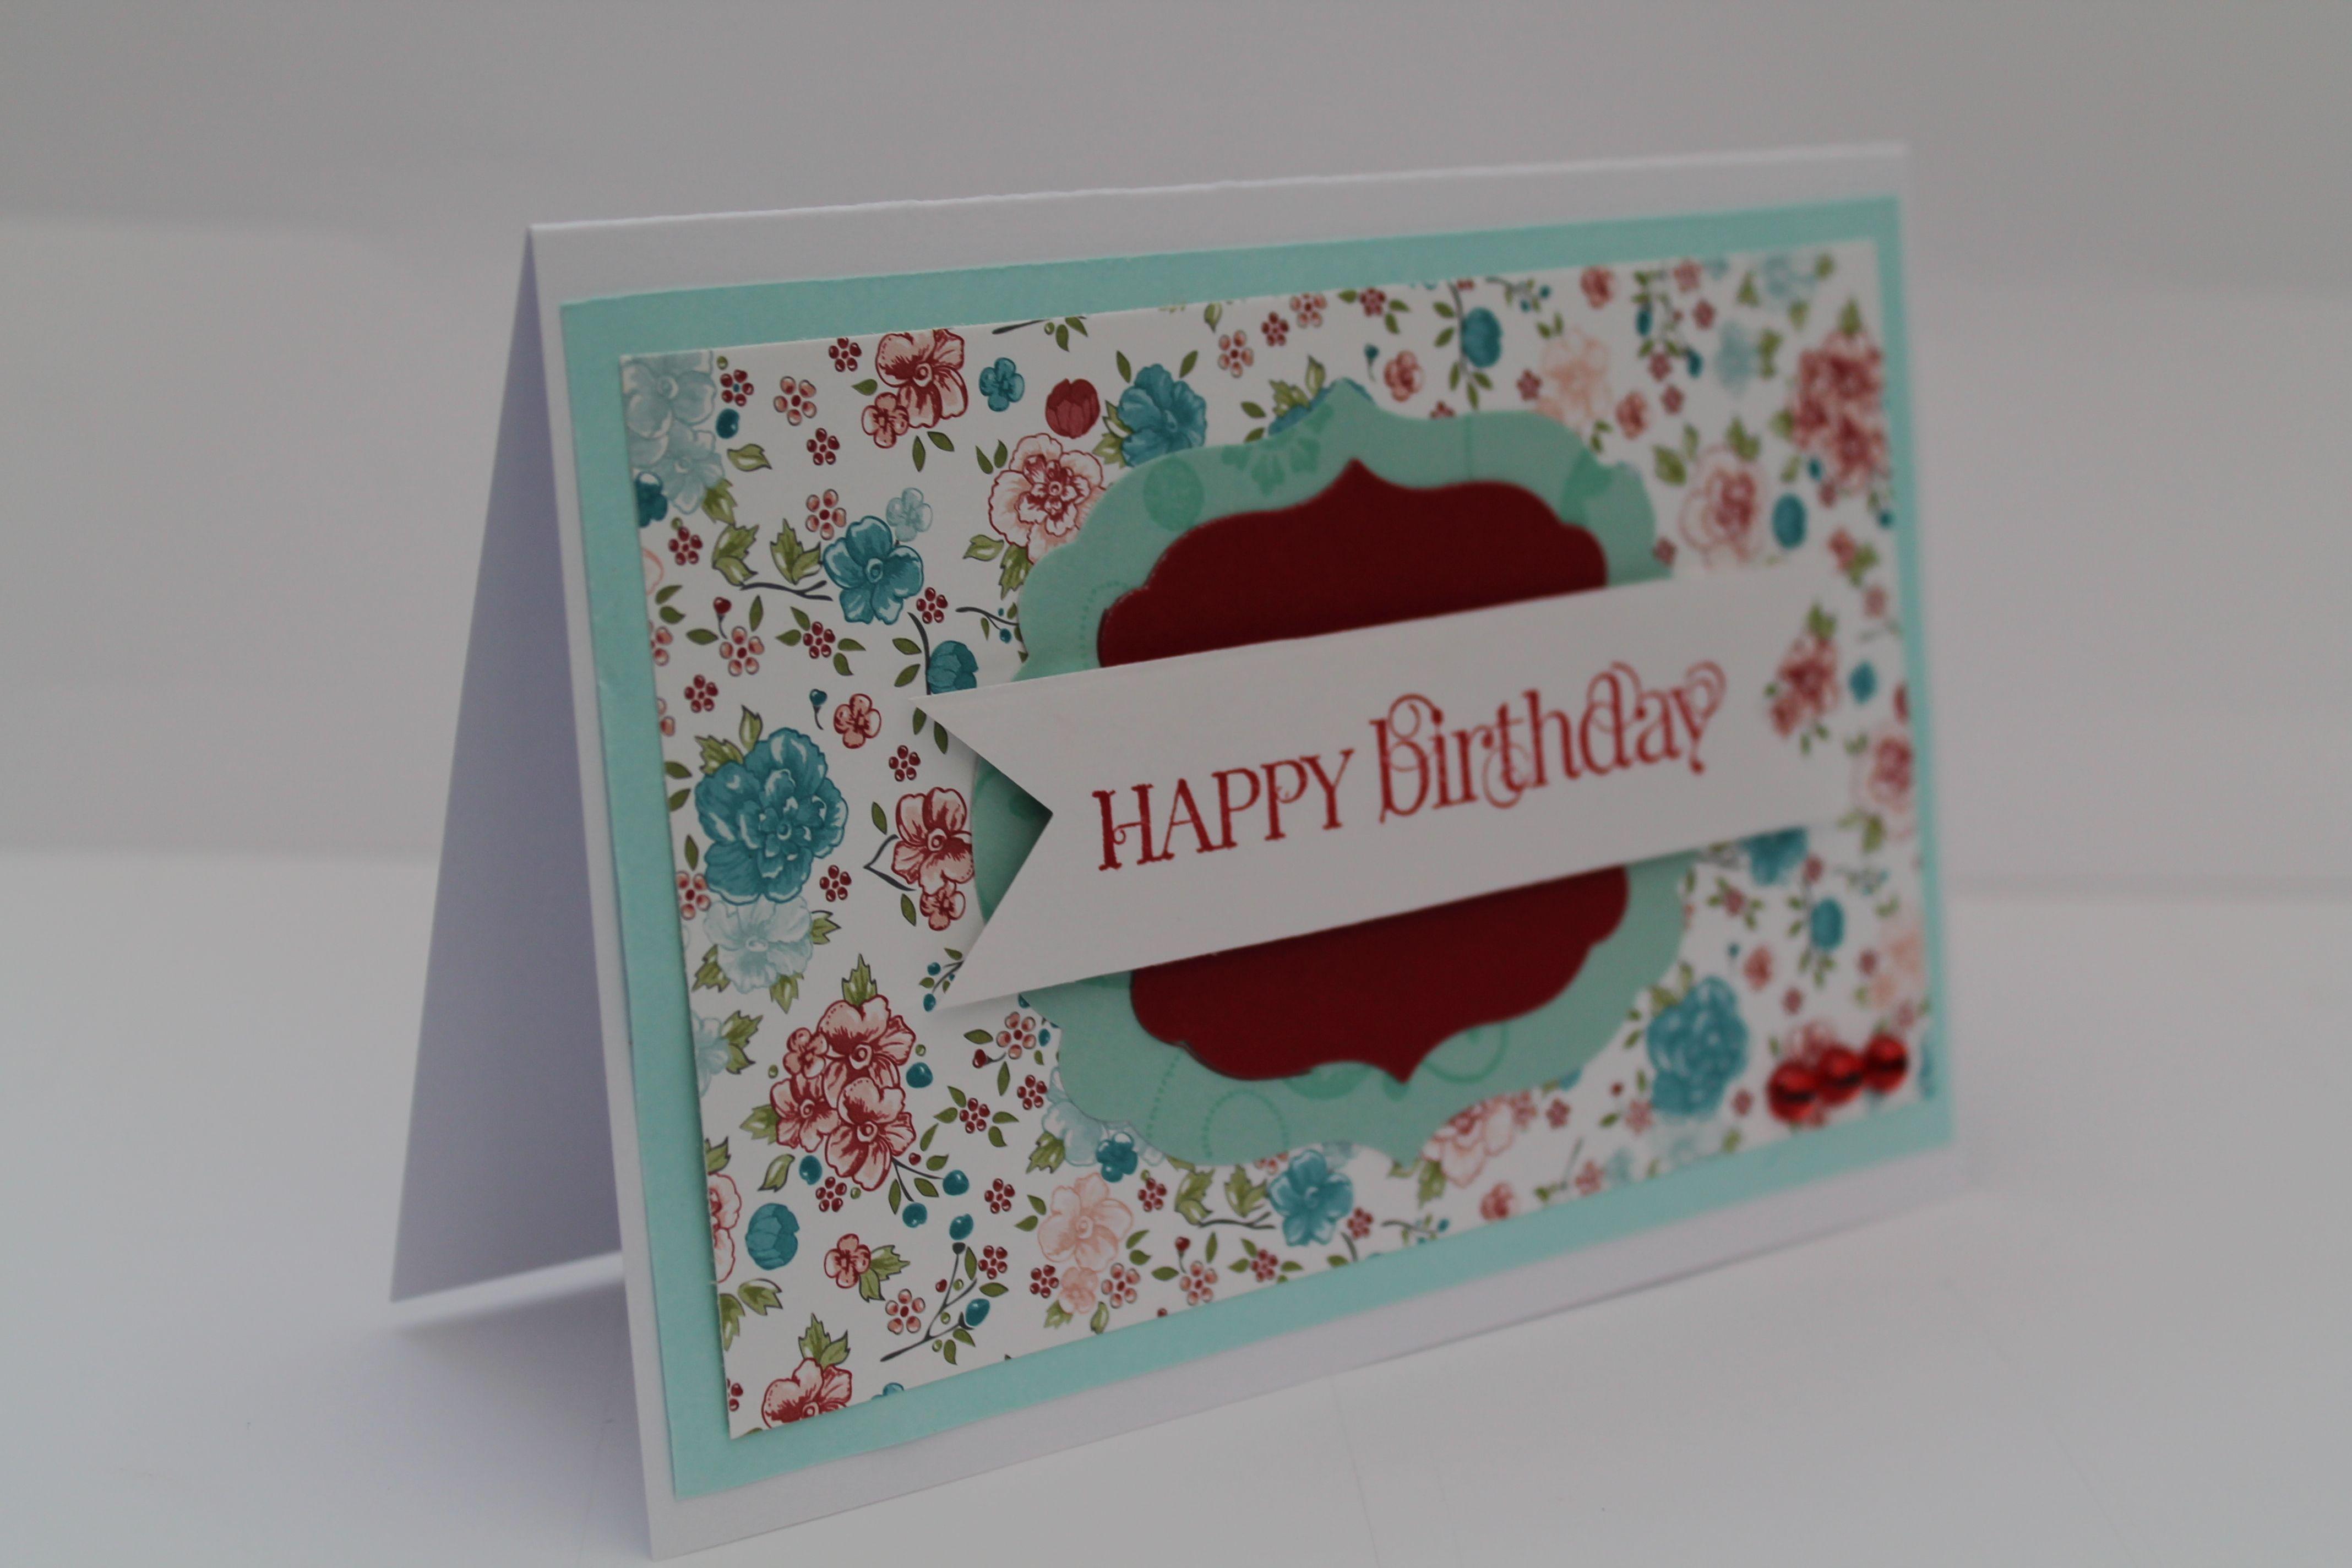 Happy birthday card stampinu up craft ideas pinterest happy